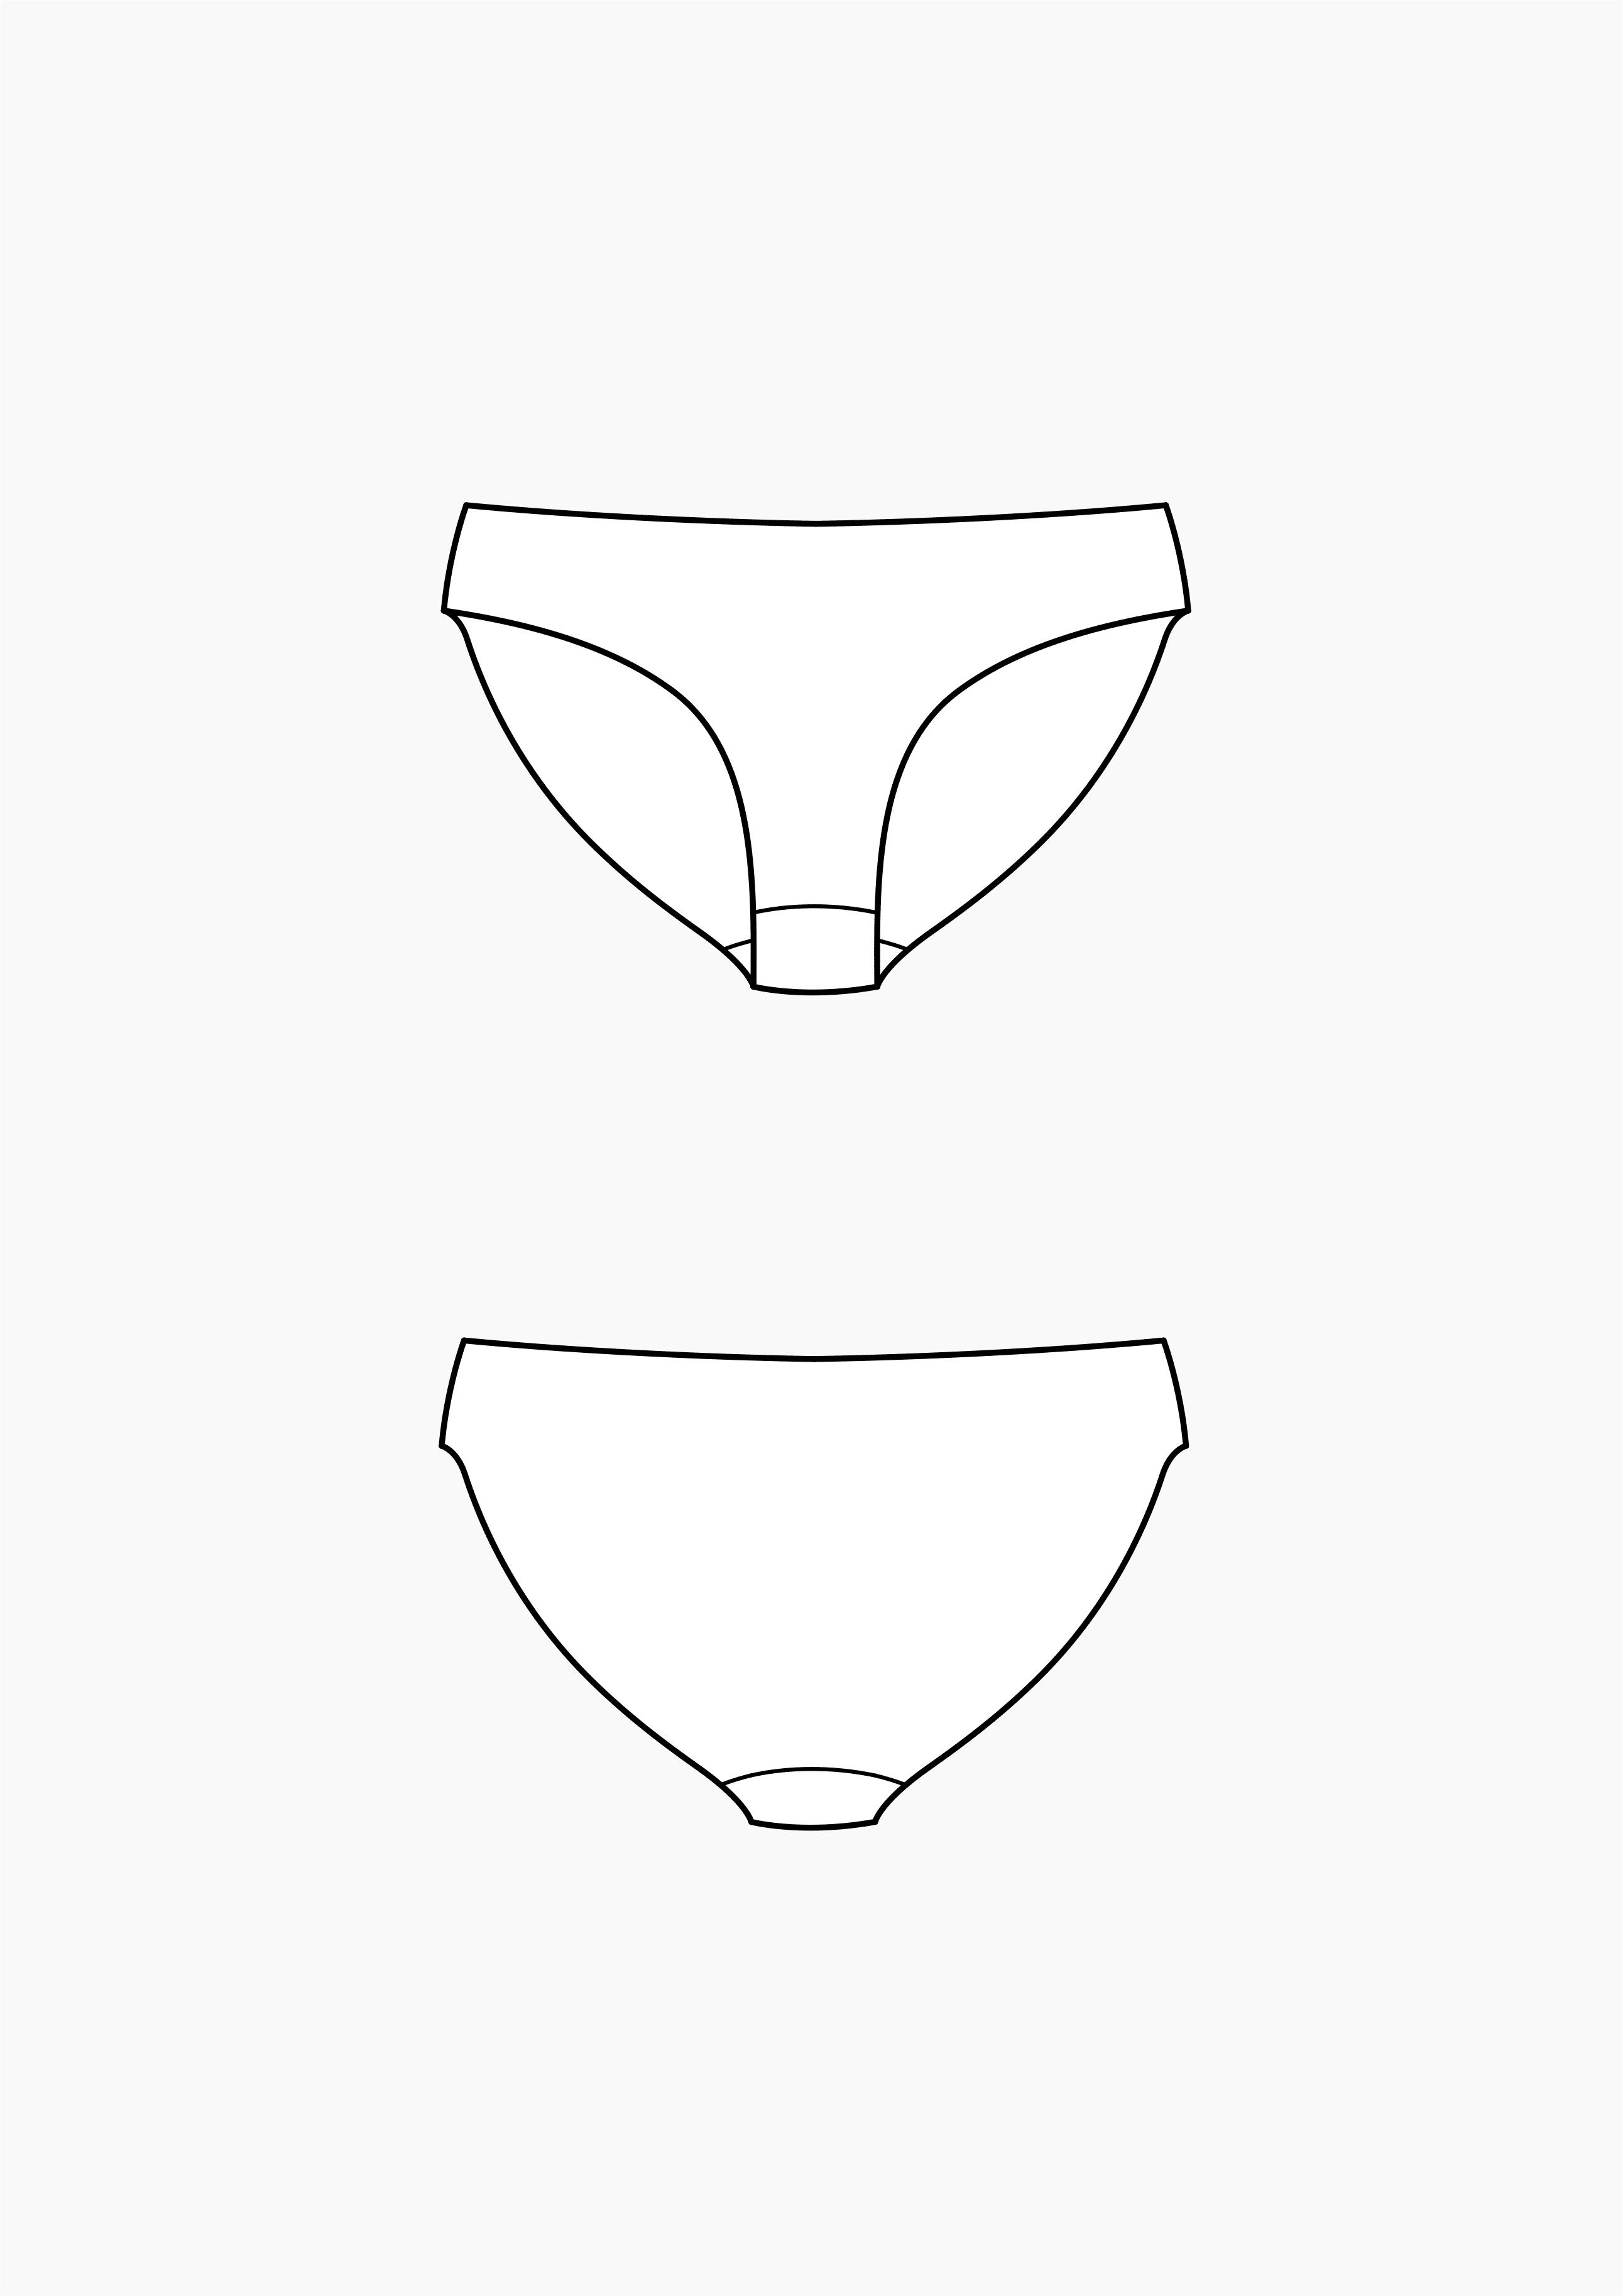 Produkt: Schnitt-Technik Grundschnitte für Slips